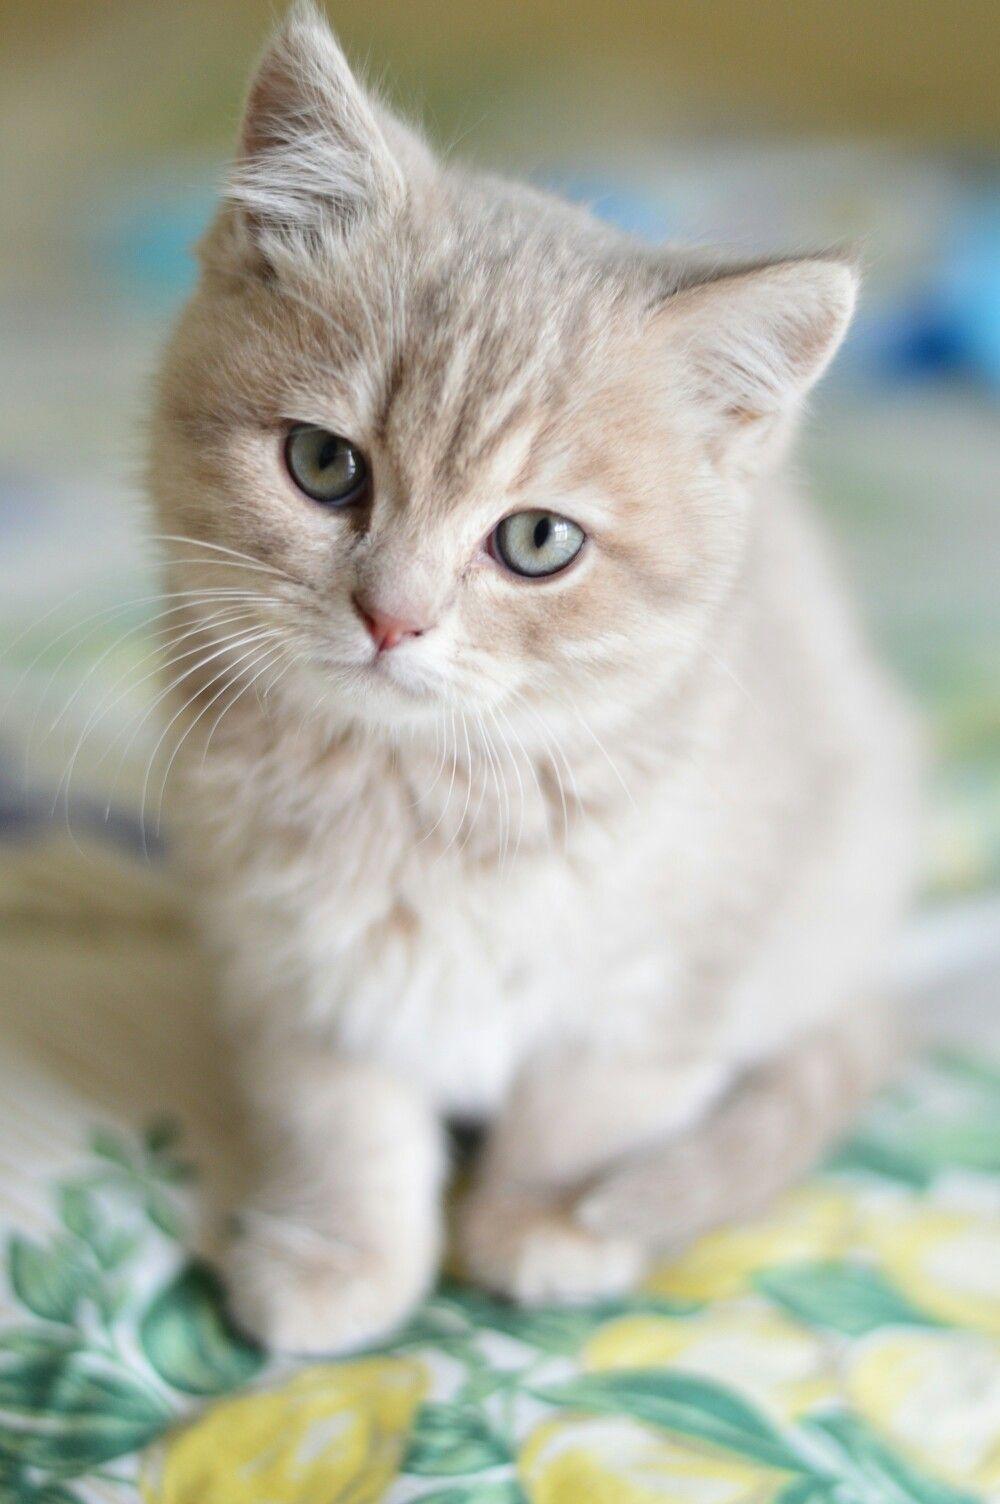 Medium Crop Of Cat Peeing On Bed